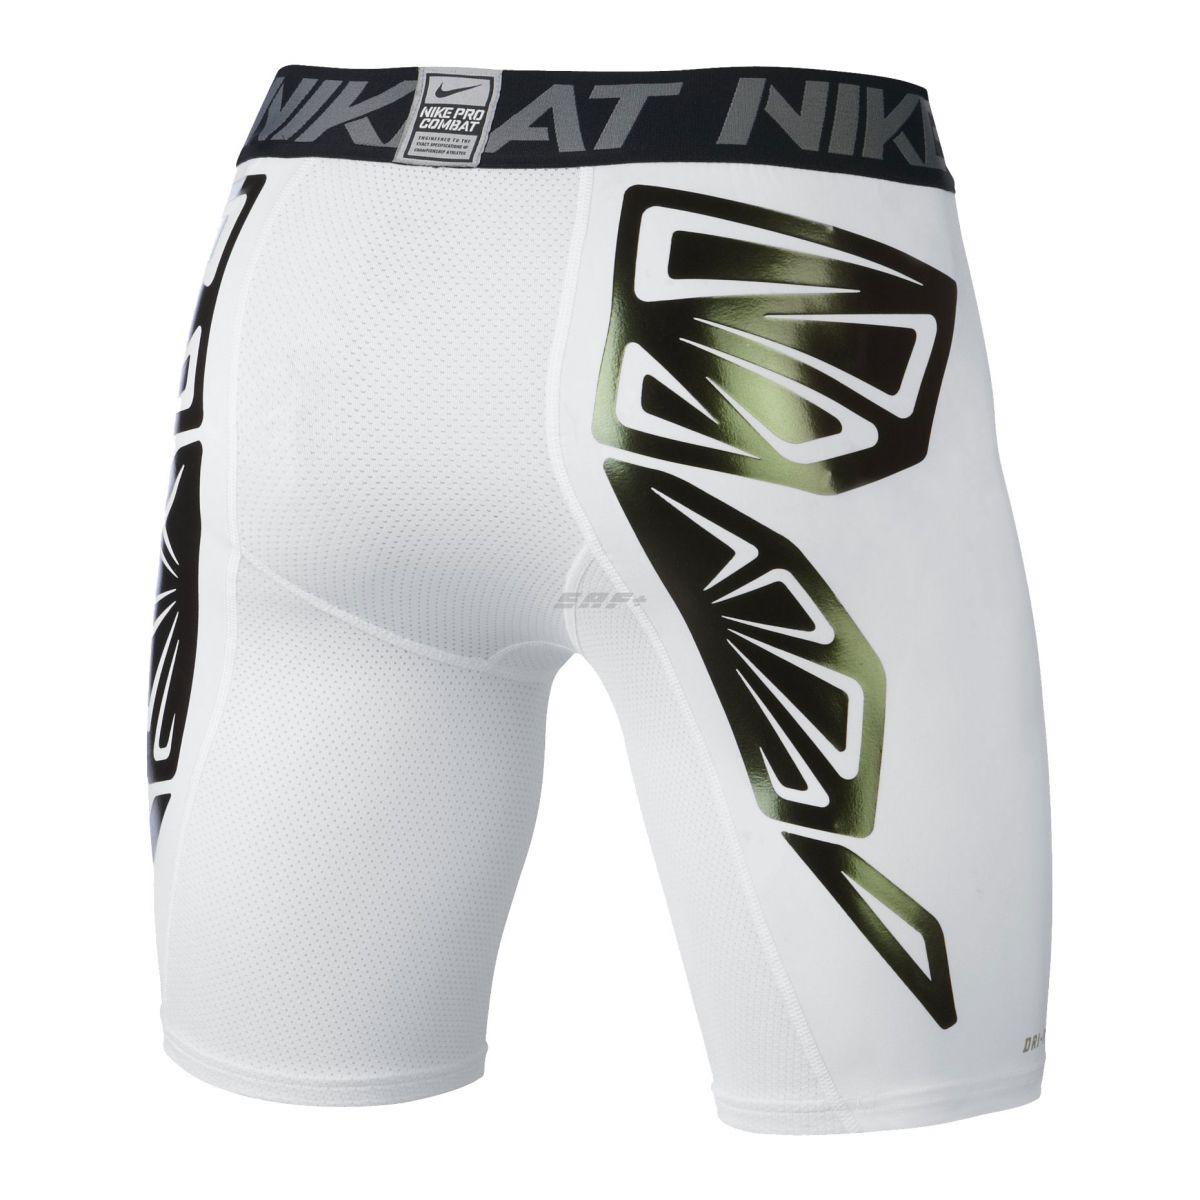 Nike Pro Трусы Npc Ultralight Slider Short 575273 Sr